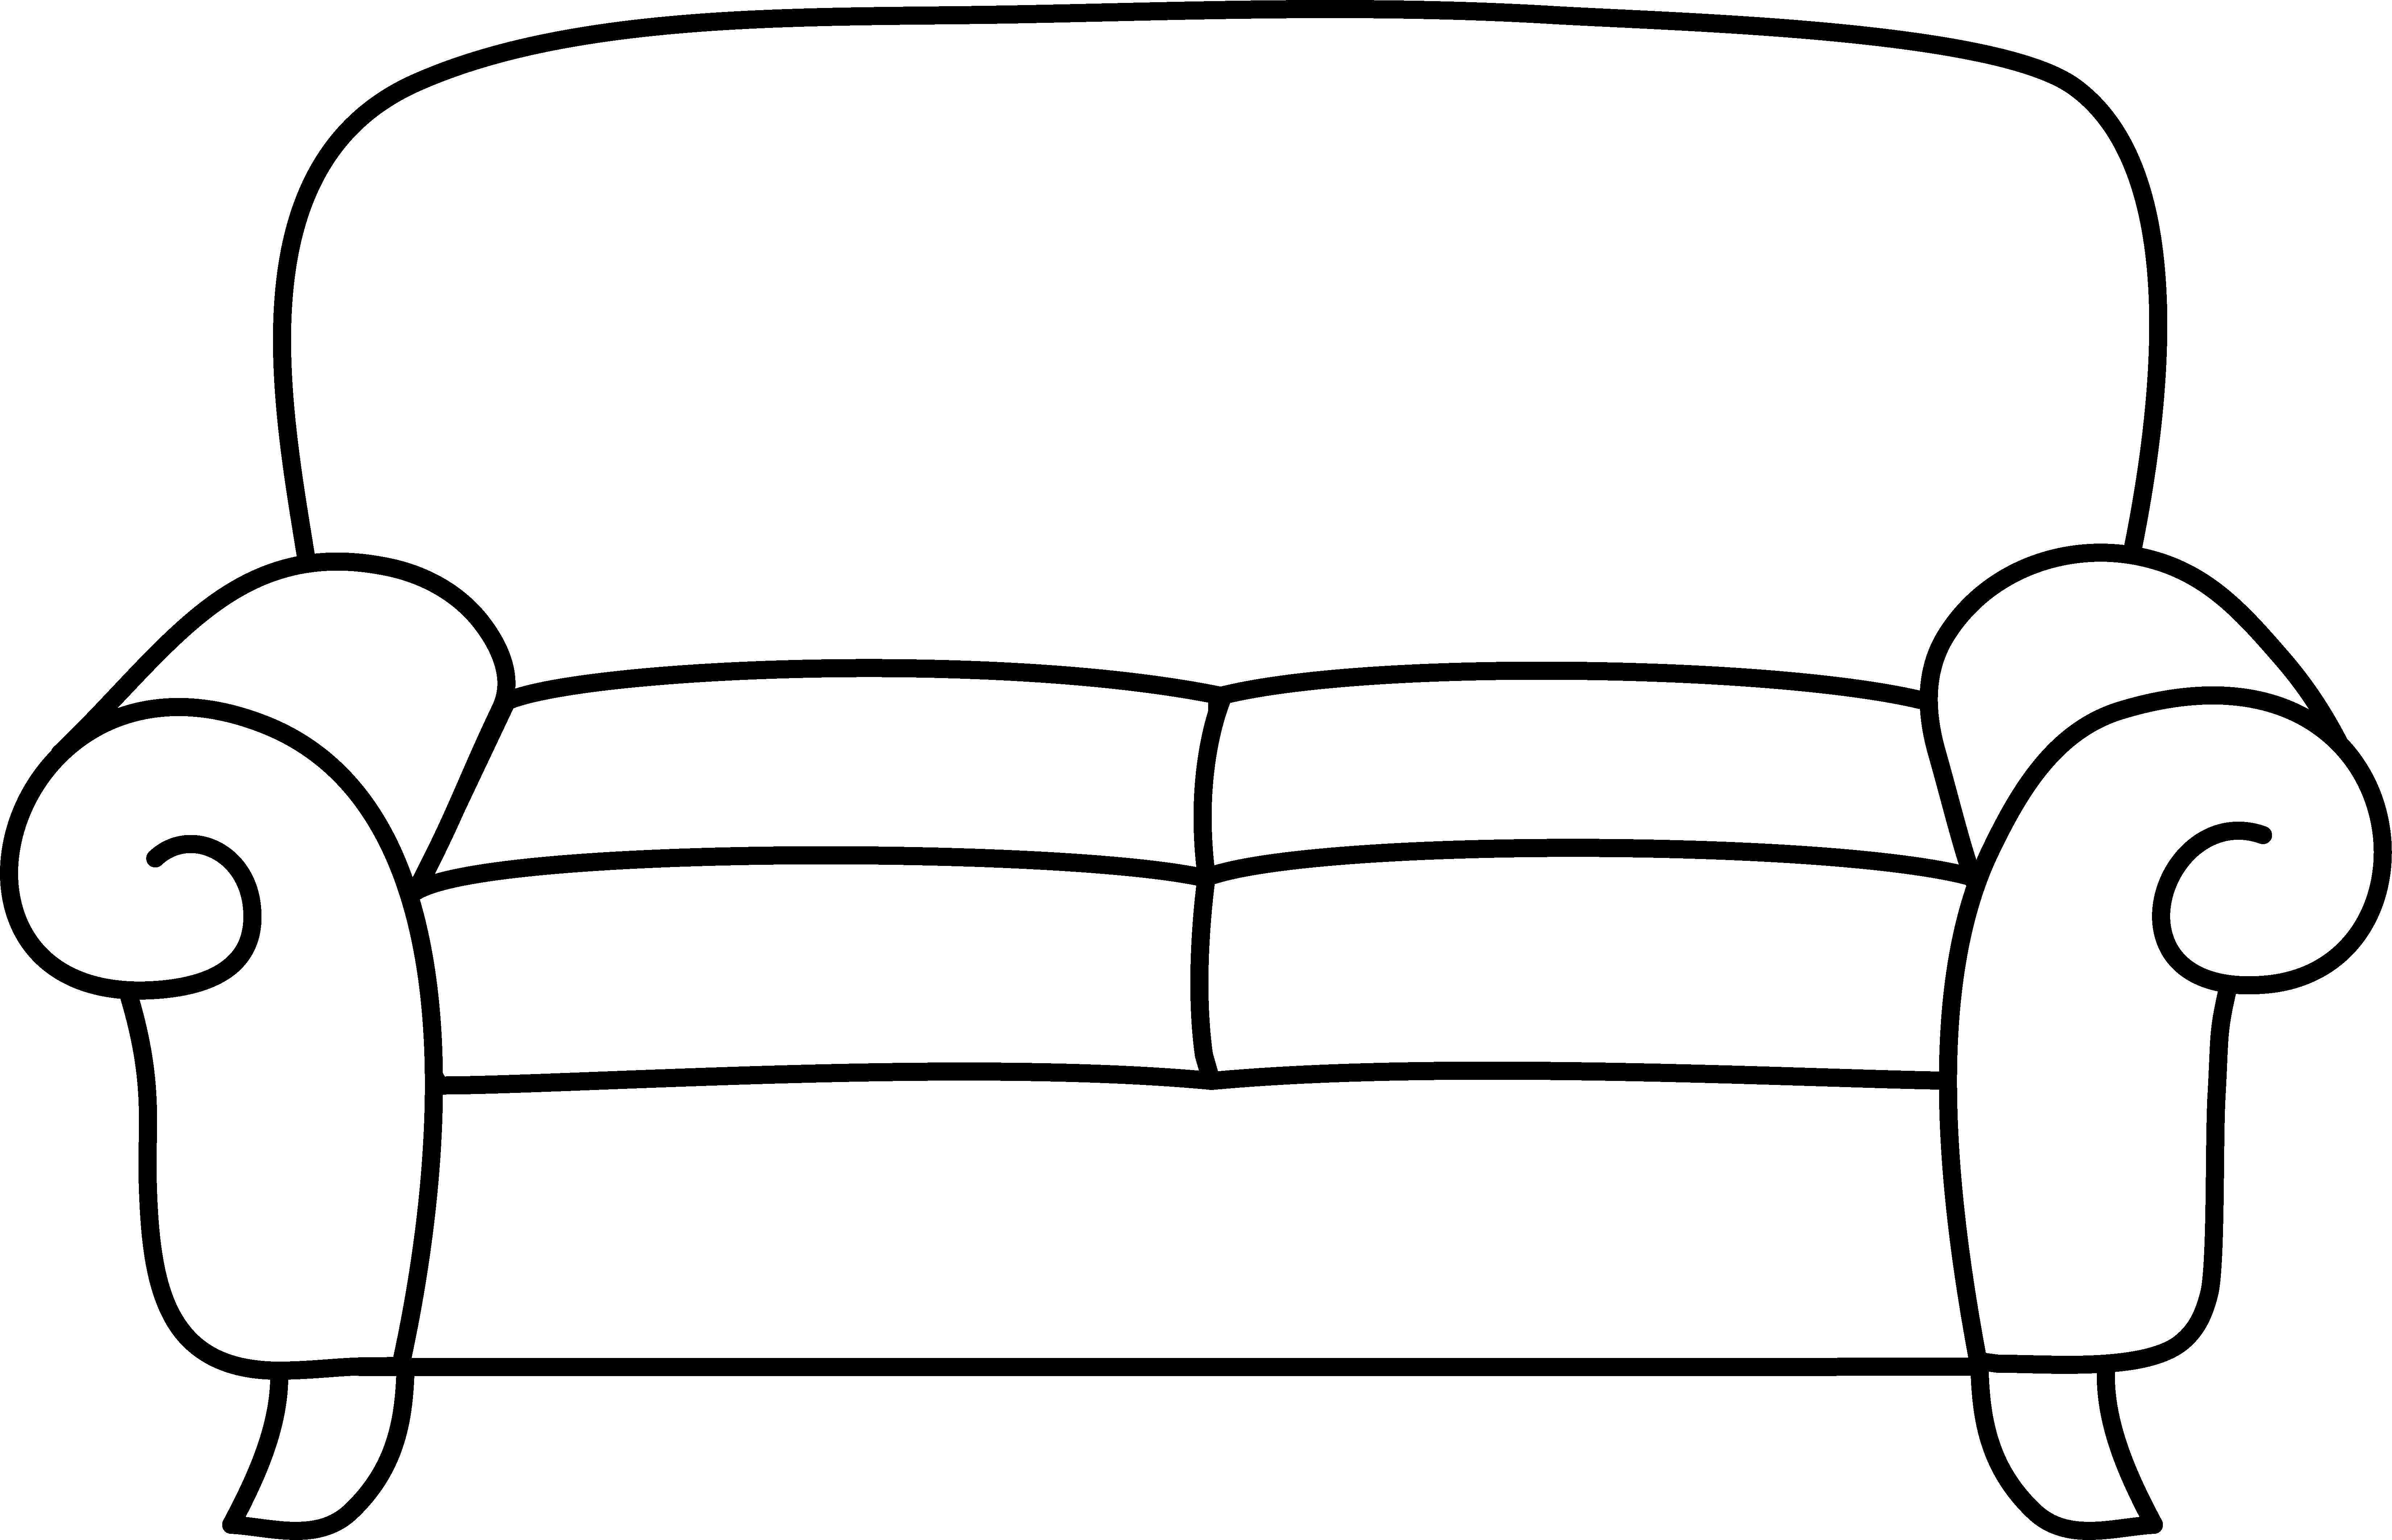 Http Sweetclipart Com Multisite Sweetclipart Files Sofa Line Art Png Como Reutilizar Ropa Vieja Reutilizar Ropa Vieja Como Reutilizar Ropa